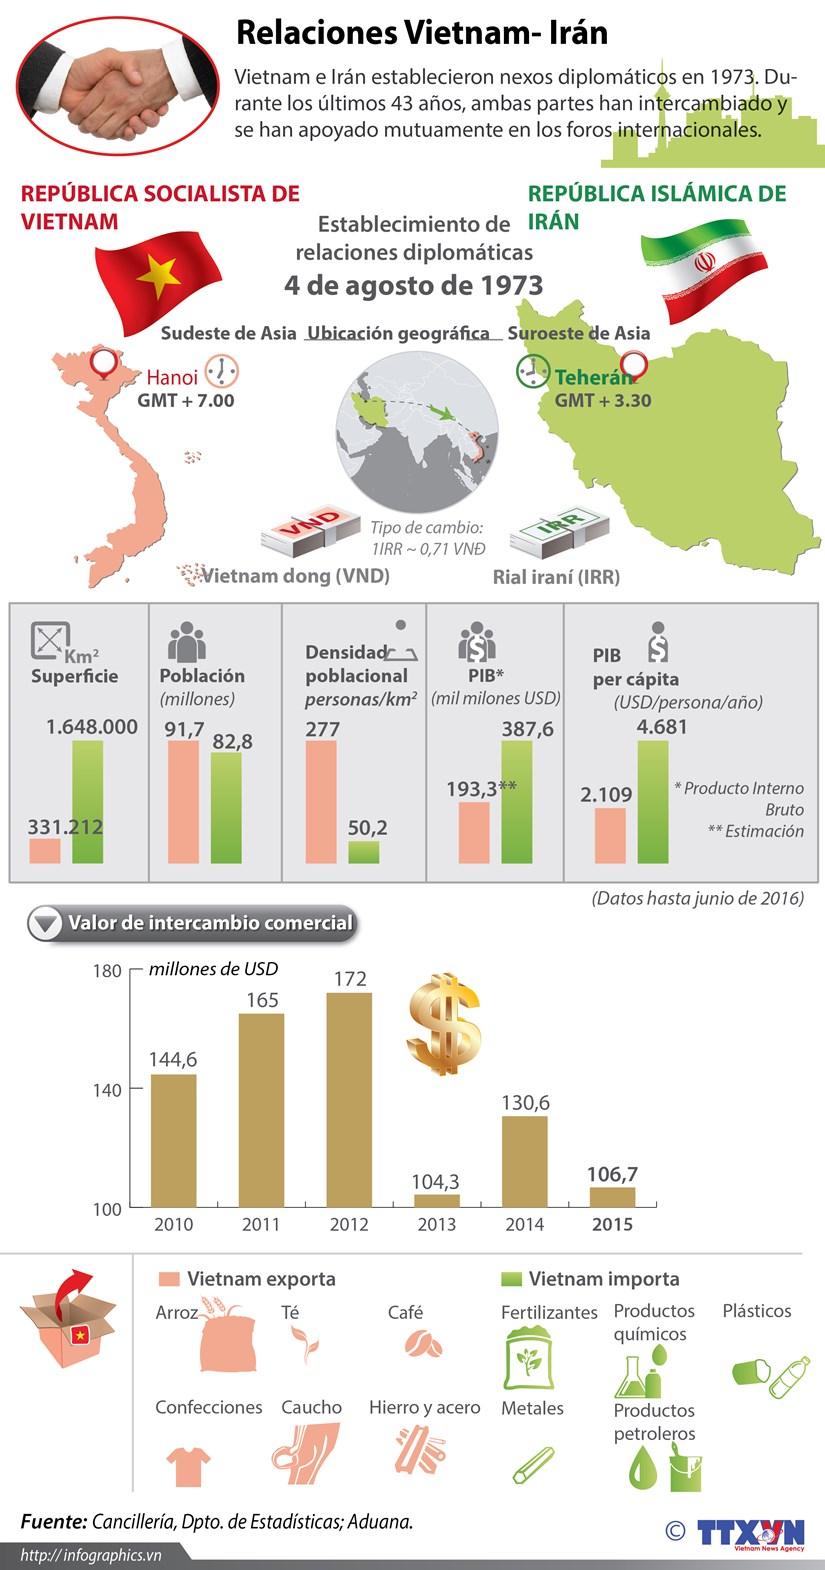 [Infografia] Relaciones Vietnam- Iran hinh anh 1